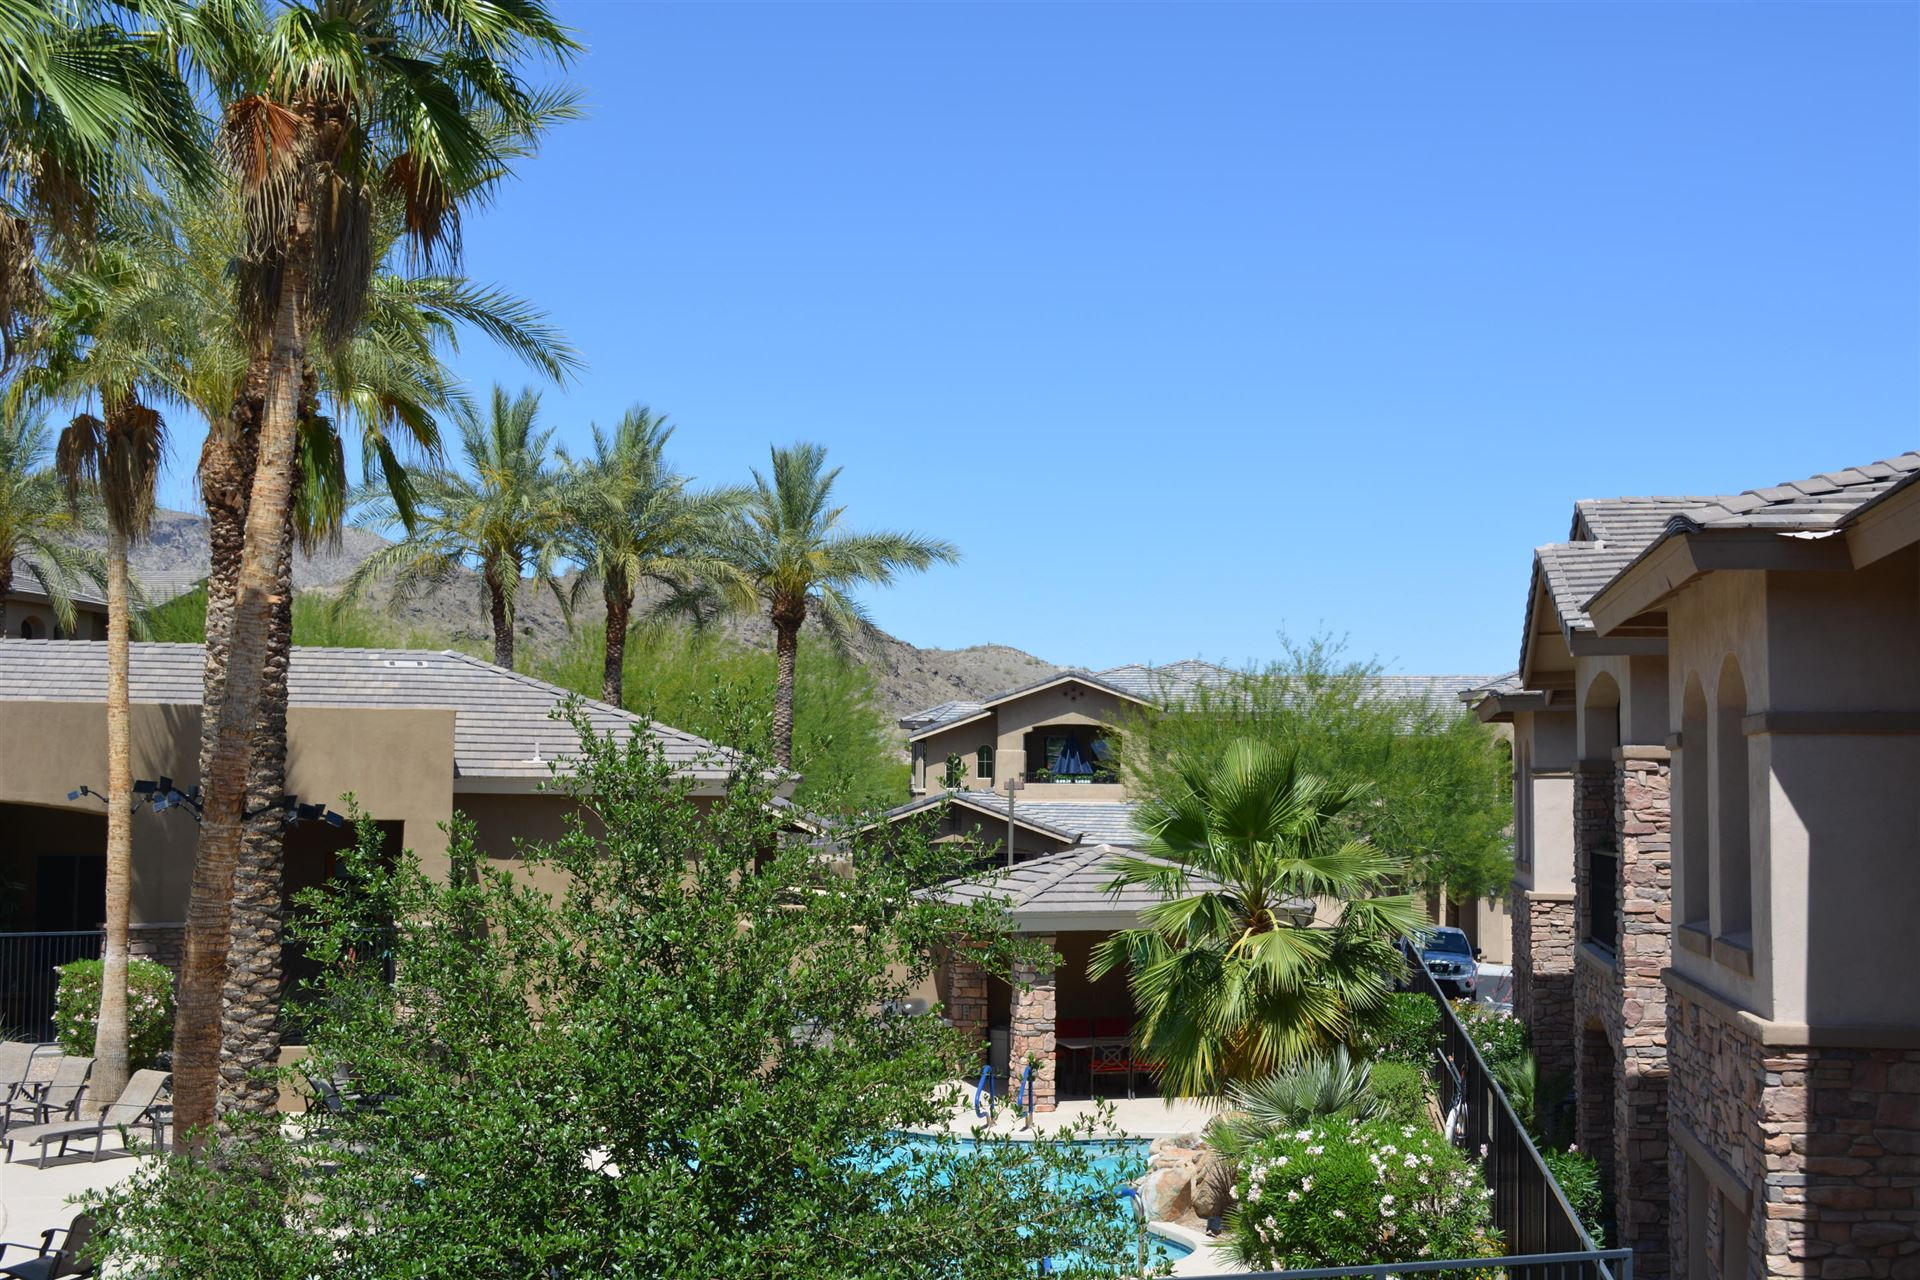 Photo of 15550 S 5TH Avenue #227, Phoenix, AZ 85045 (MLS # 6232177)